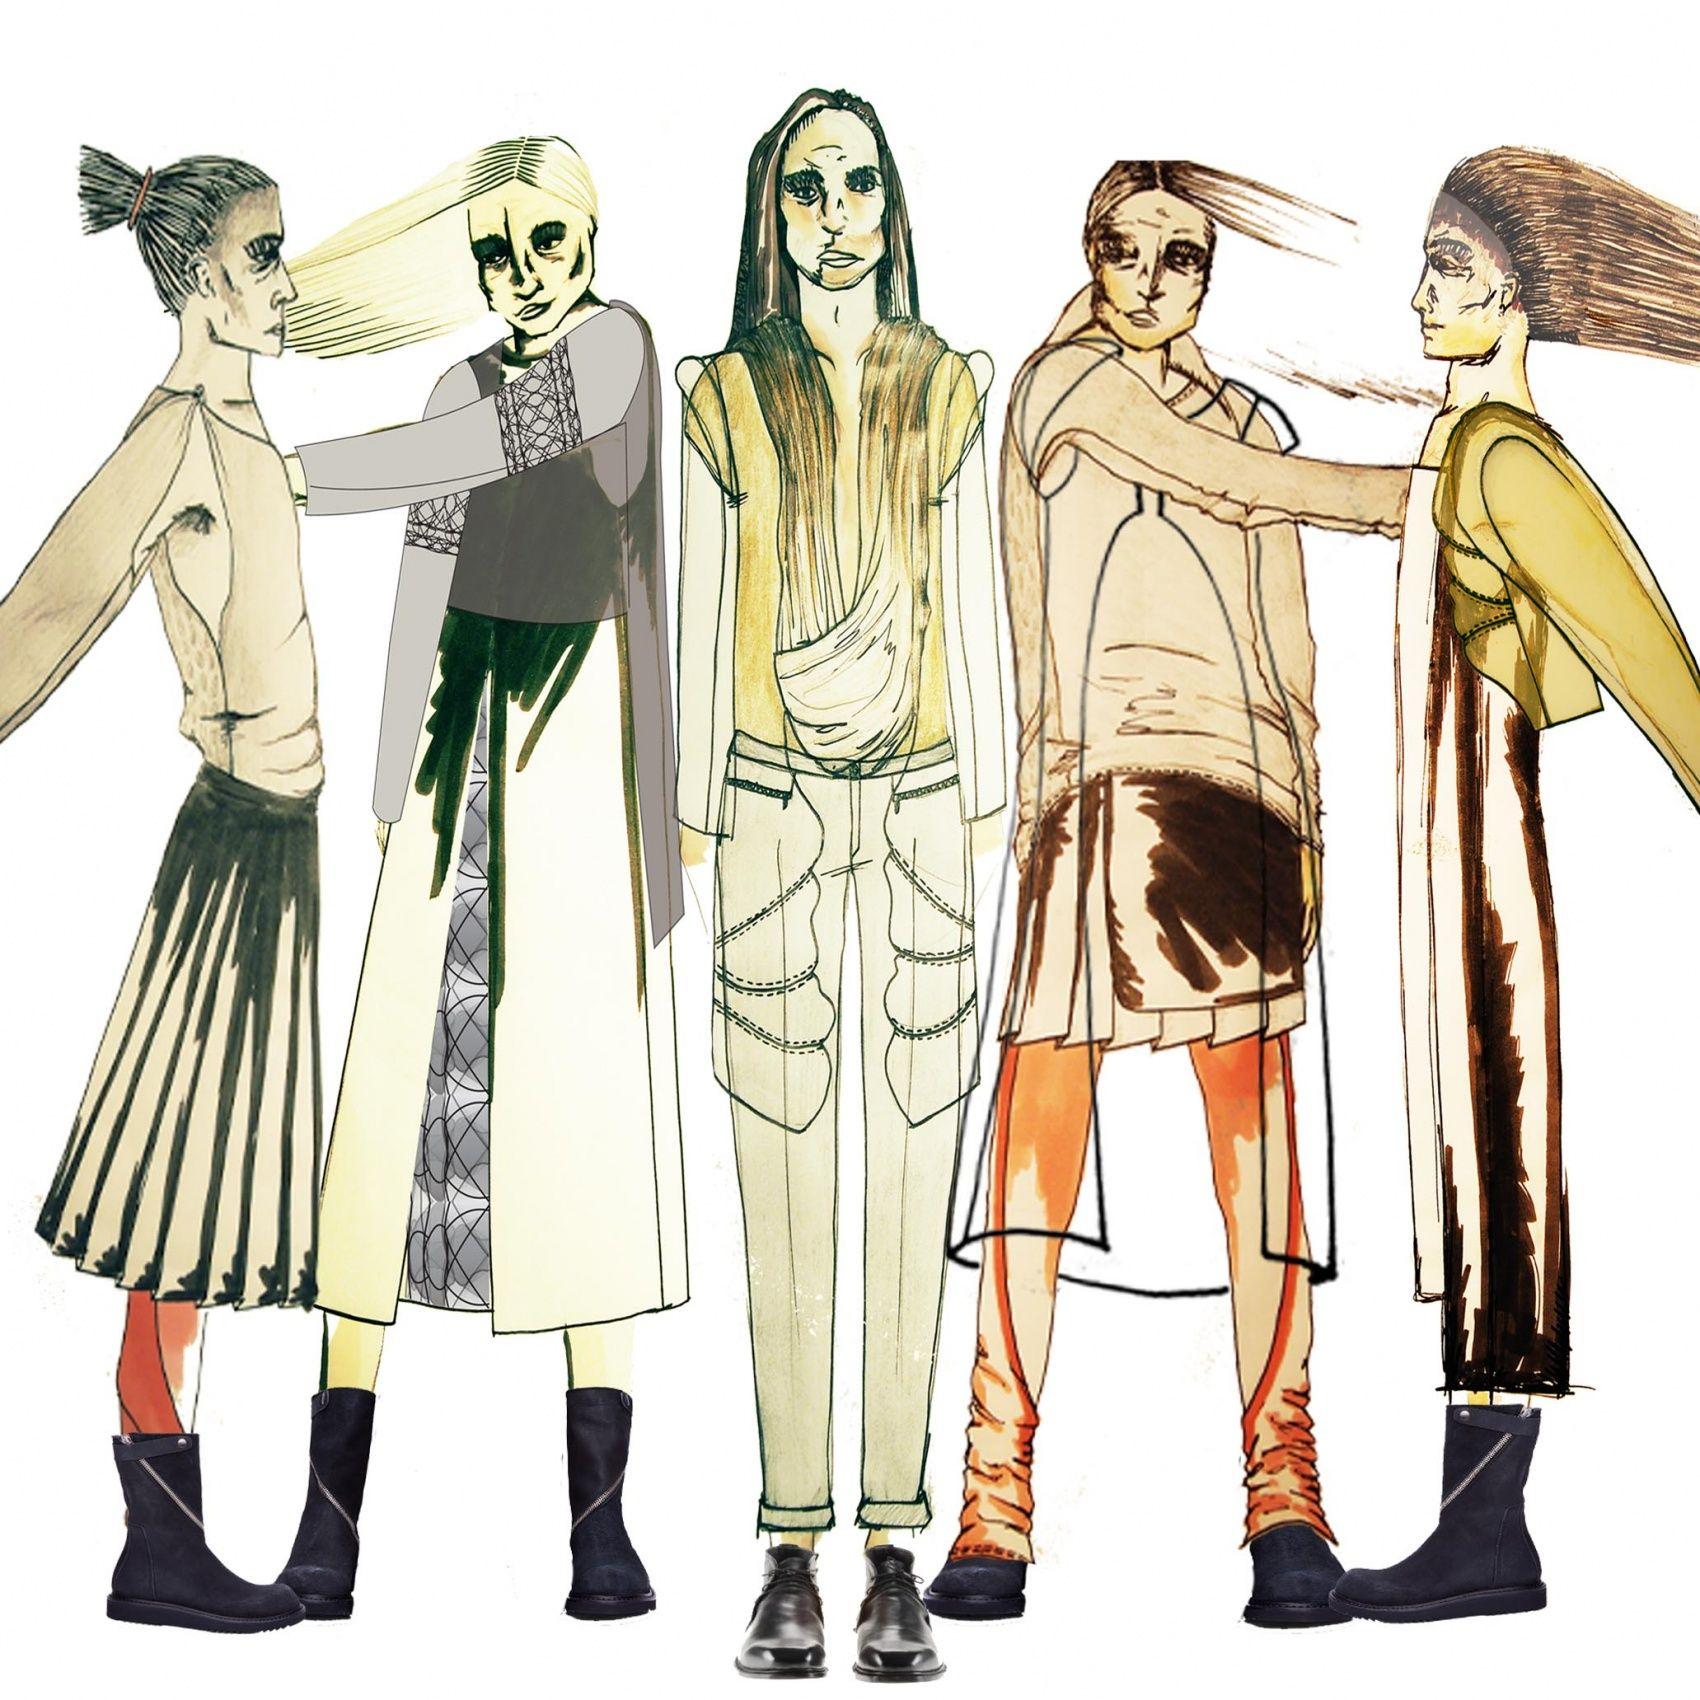 #fashion #illustration #rick #owens #rickowens #design #menswear #conceptualdesign #inspire #create  check out more of my work at www.ceosmanfashion.portfoliobox.com   @Portfoliobox